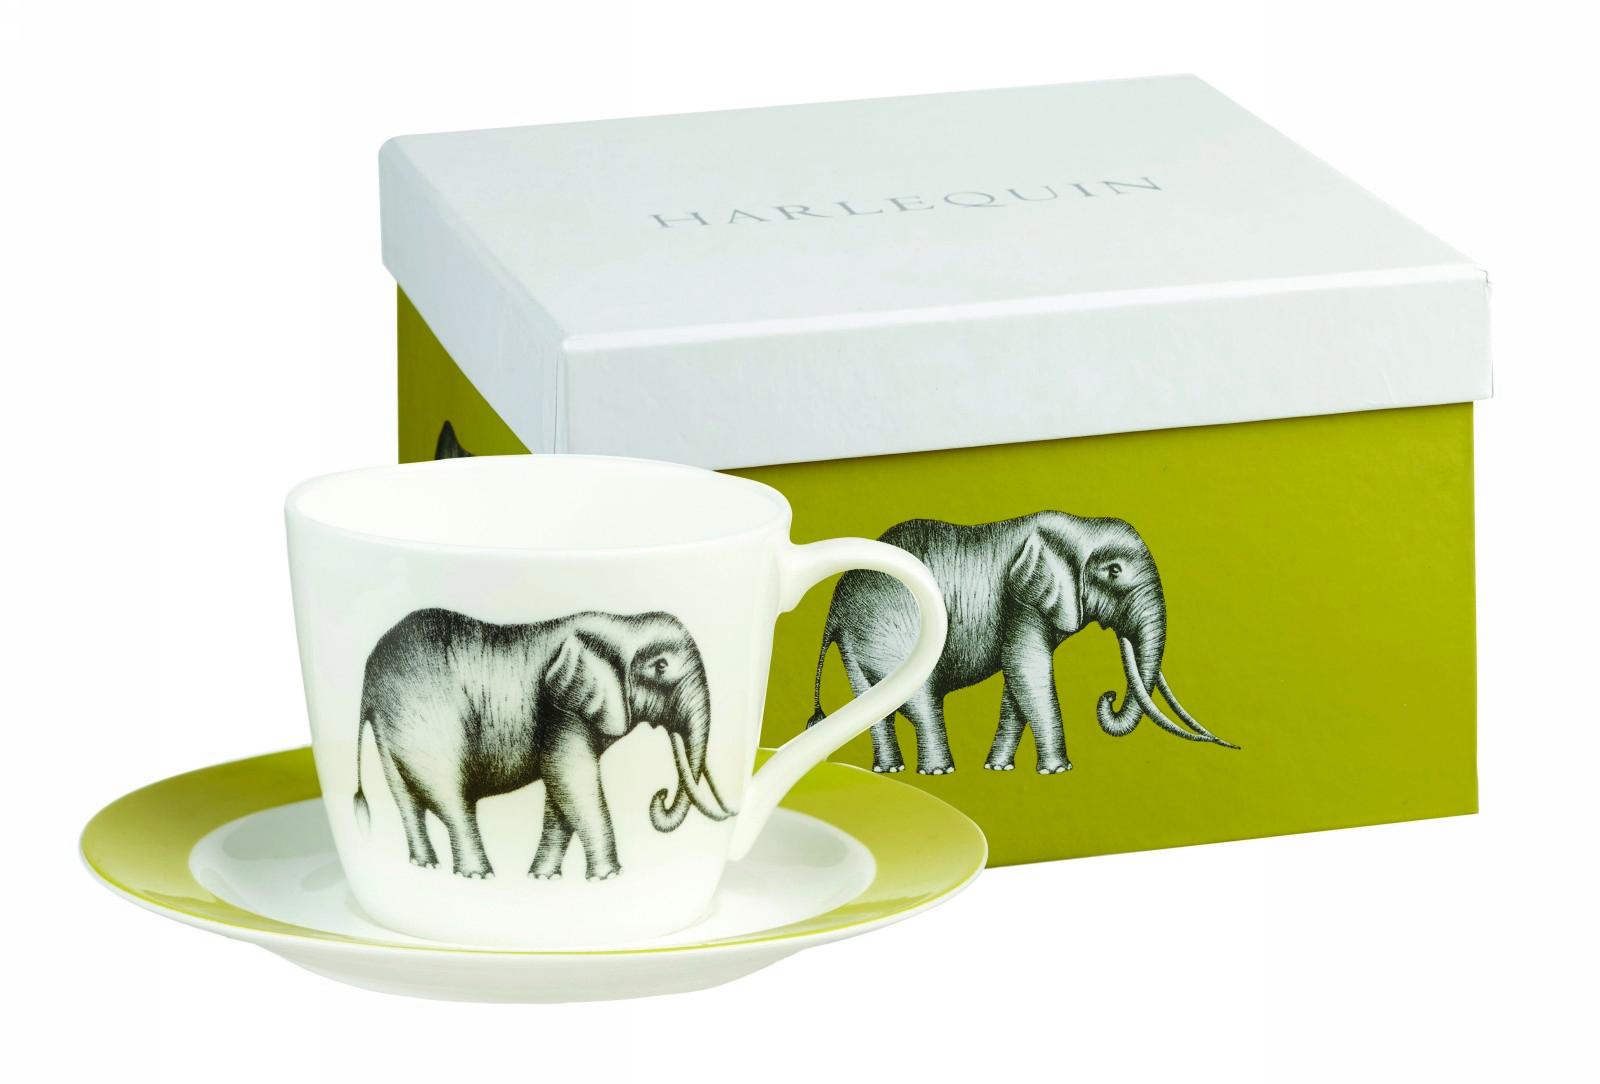 Чайный набор Churchill: чашка с блюдцем, 200 мл, цвет: белый Саванна от Арлекин